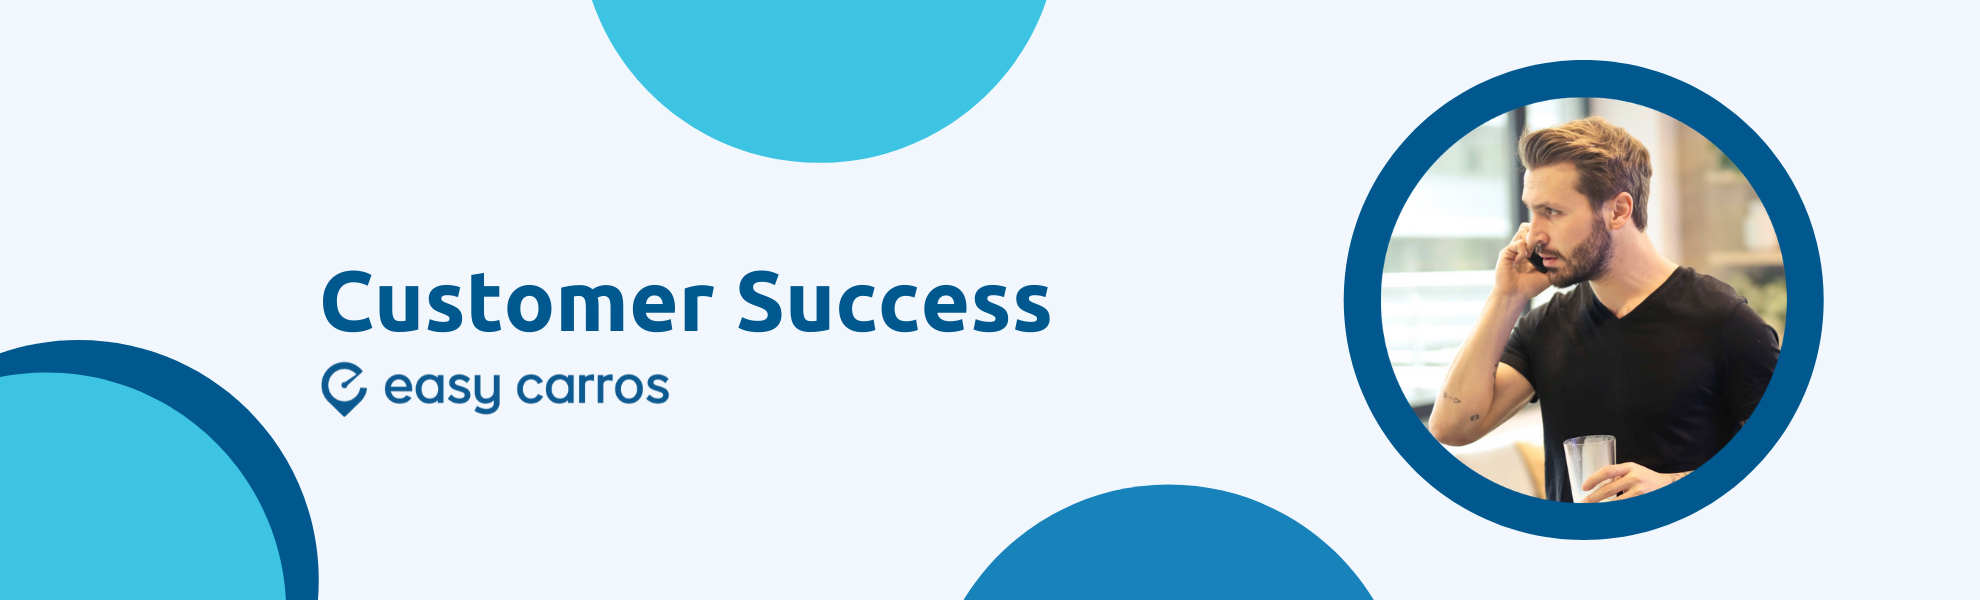 Customer Success Pleno